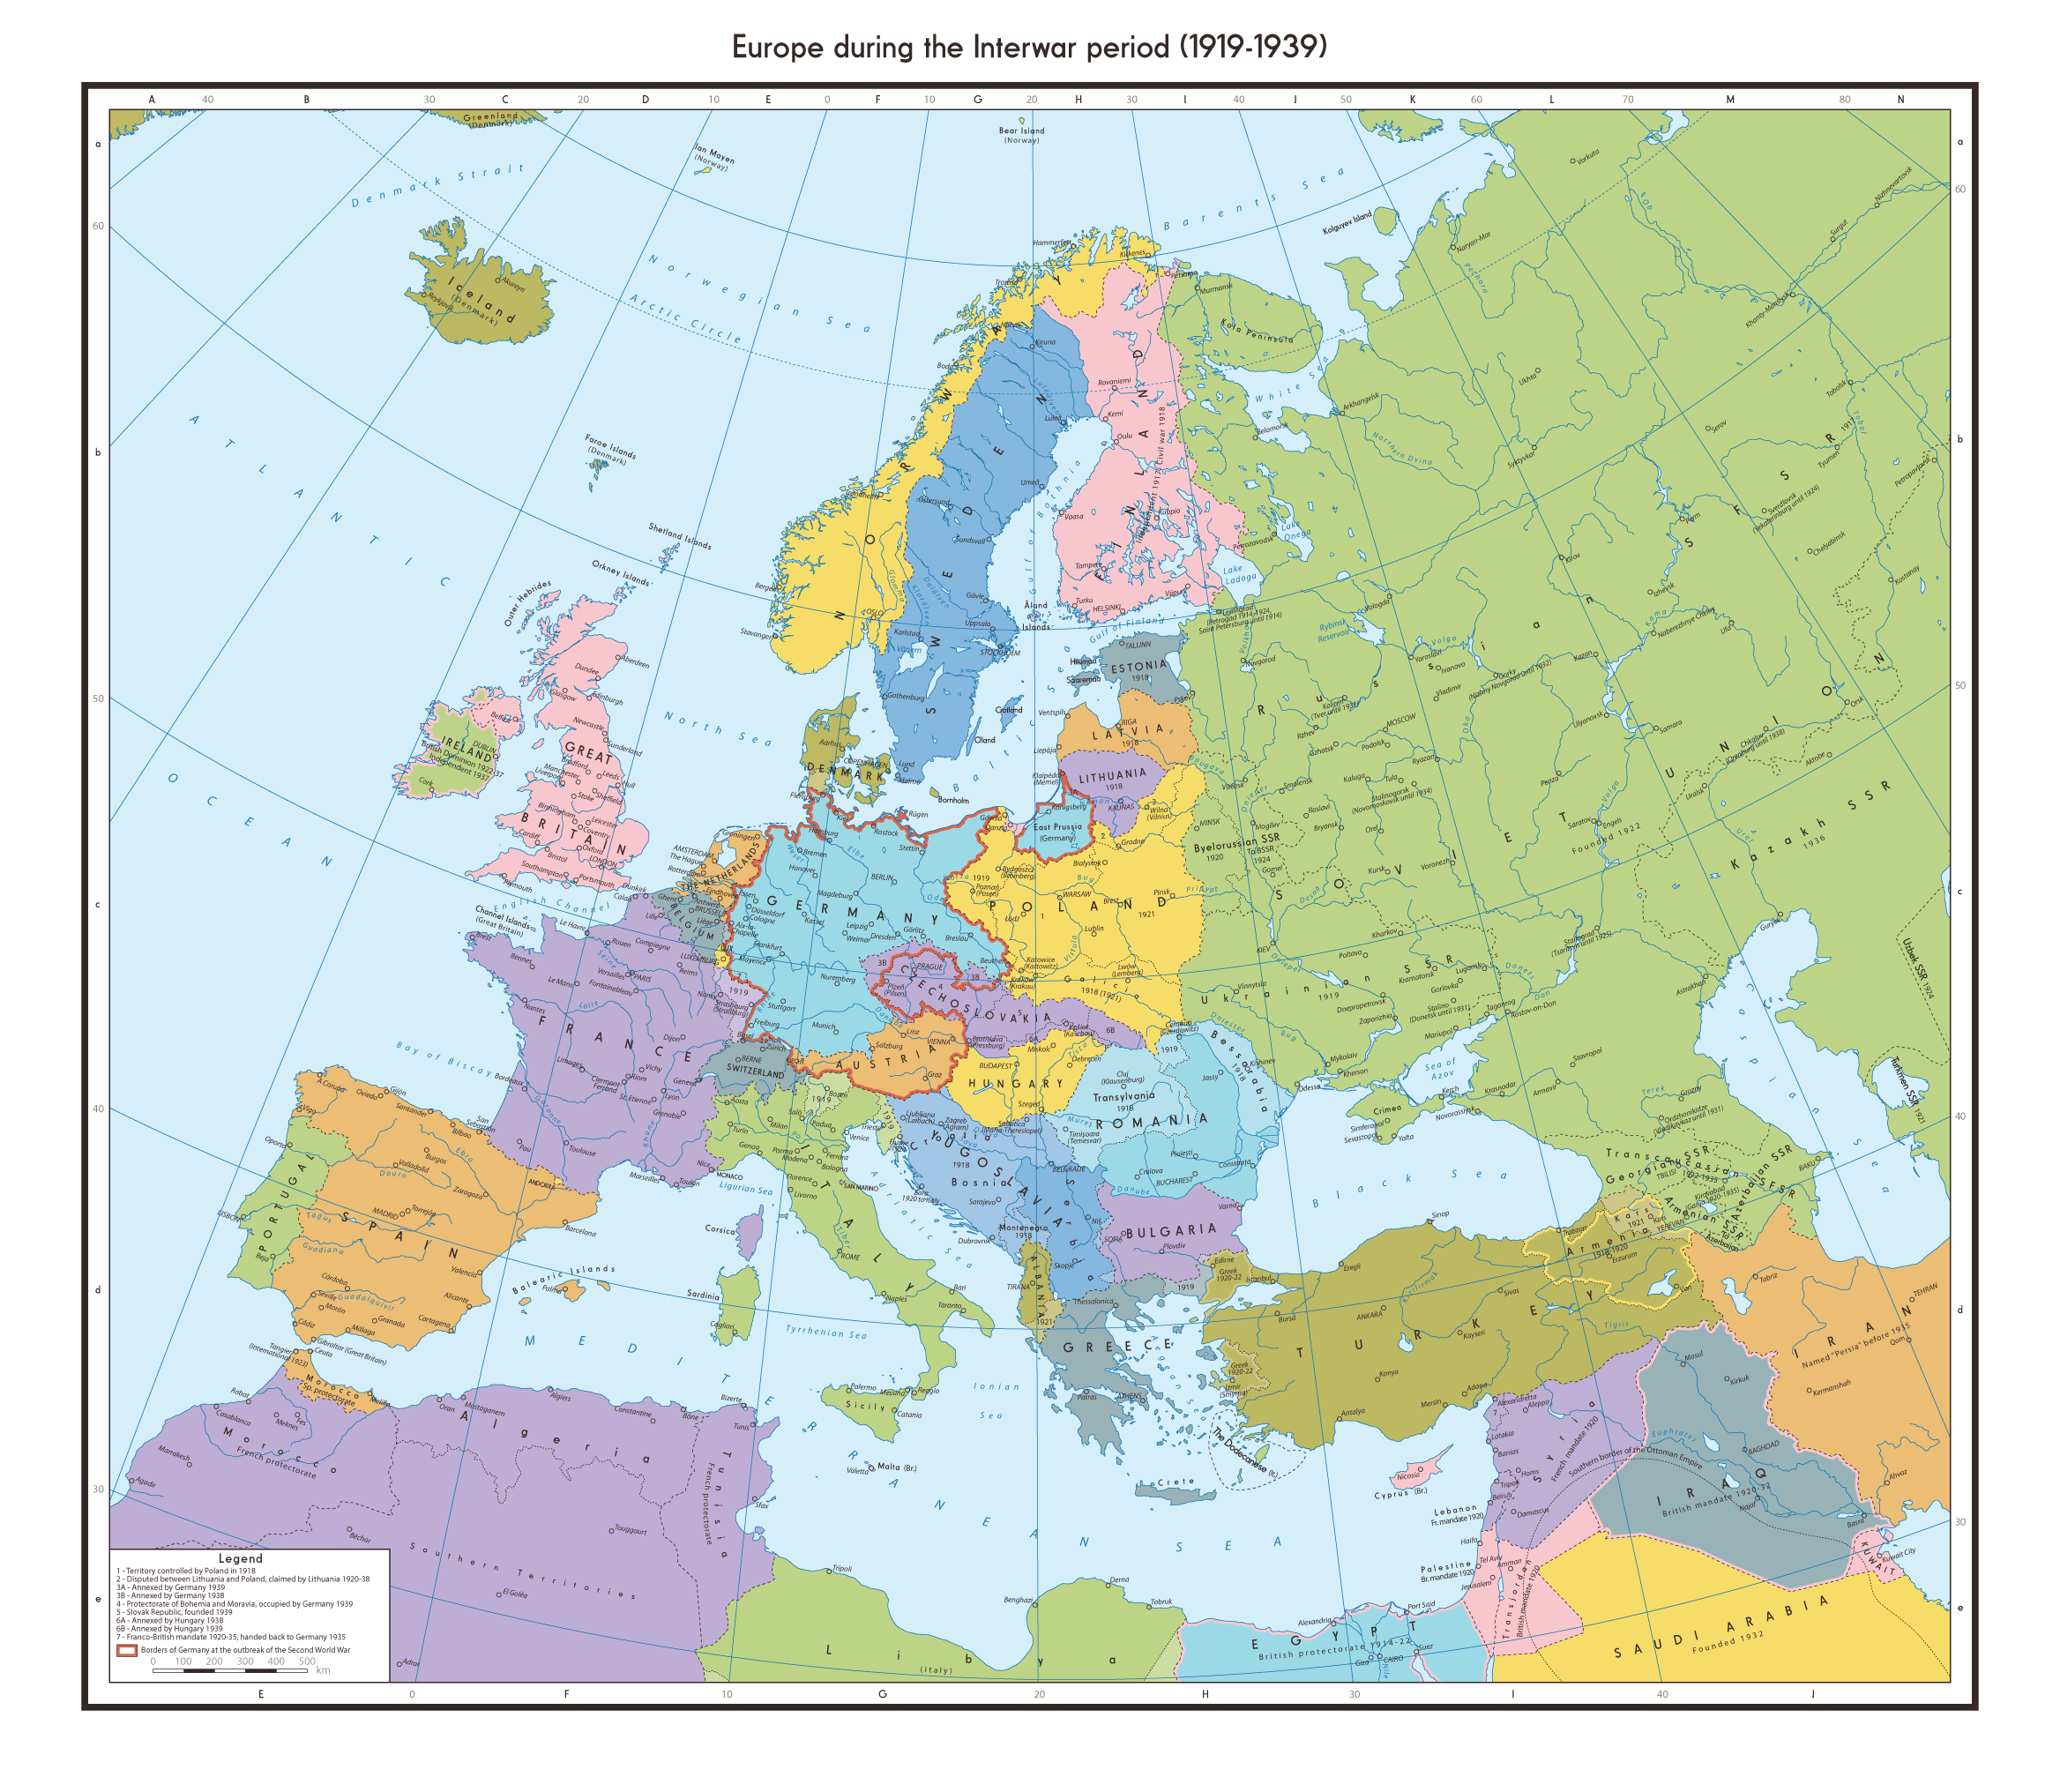 Interwar Europe Map.Europe S Shifting Borders Interwar Period 1919 1939 2336x2032